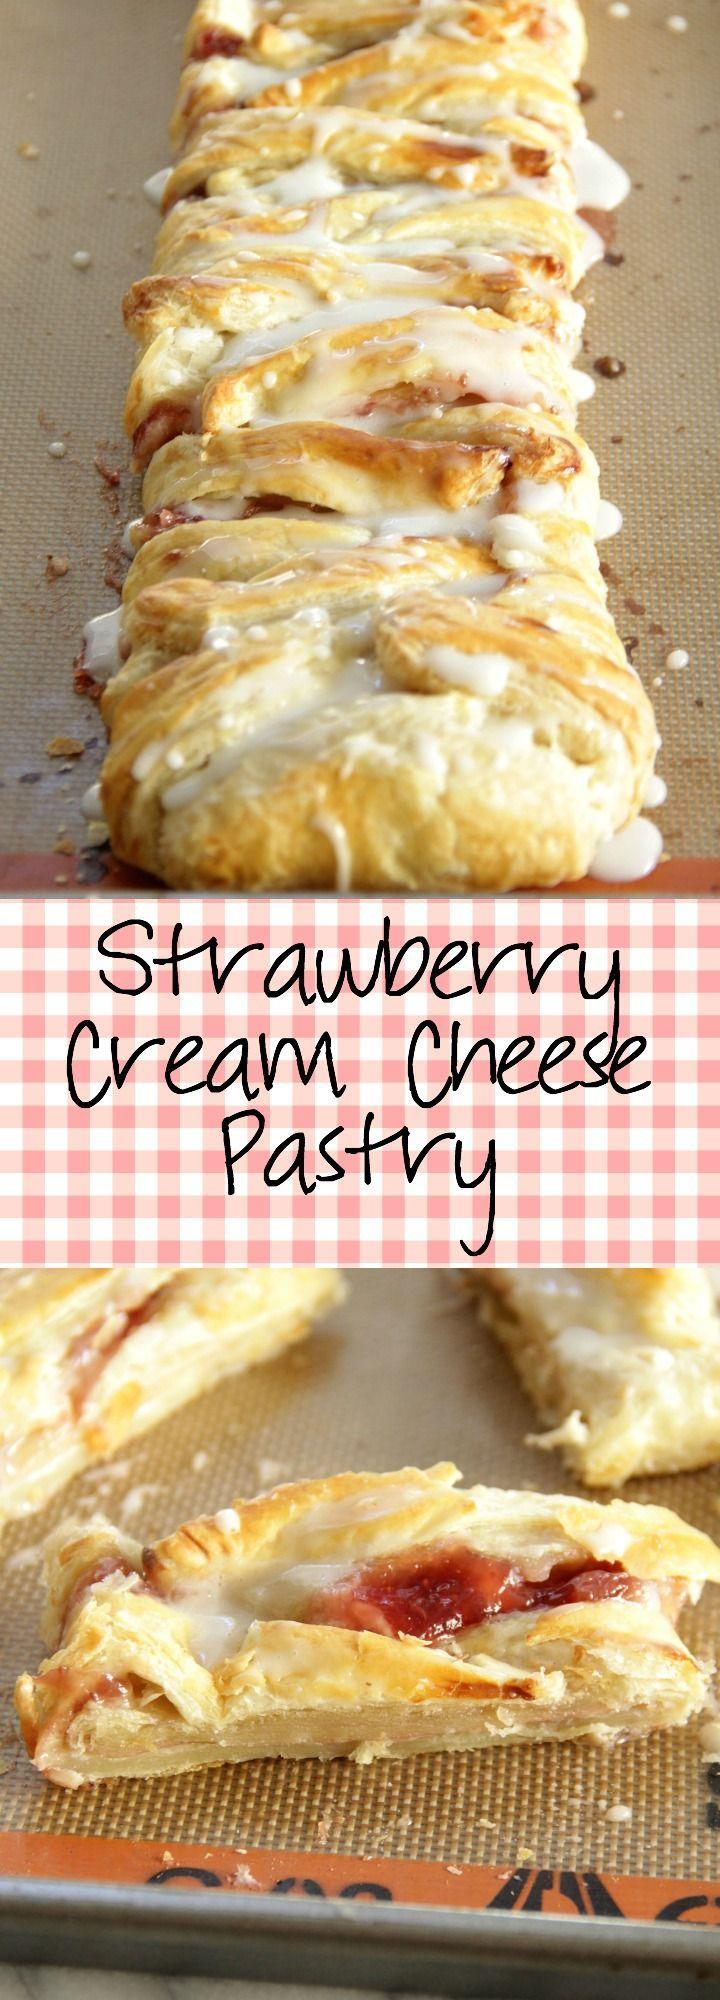 Strawberry Cream Cheese Pastry